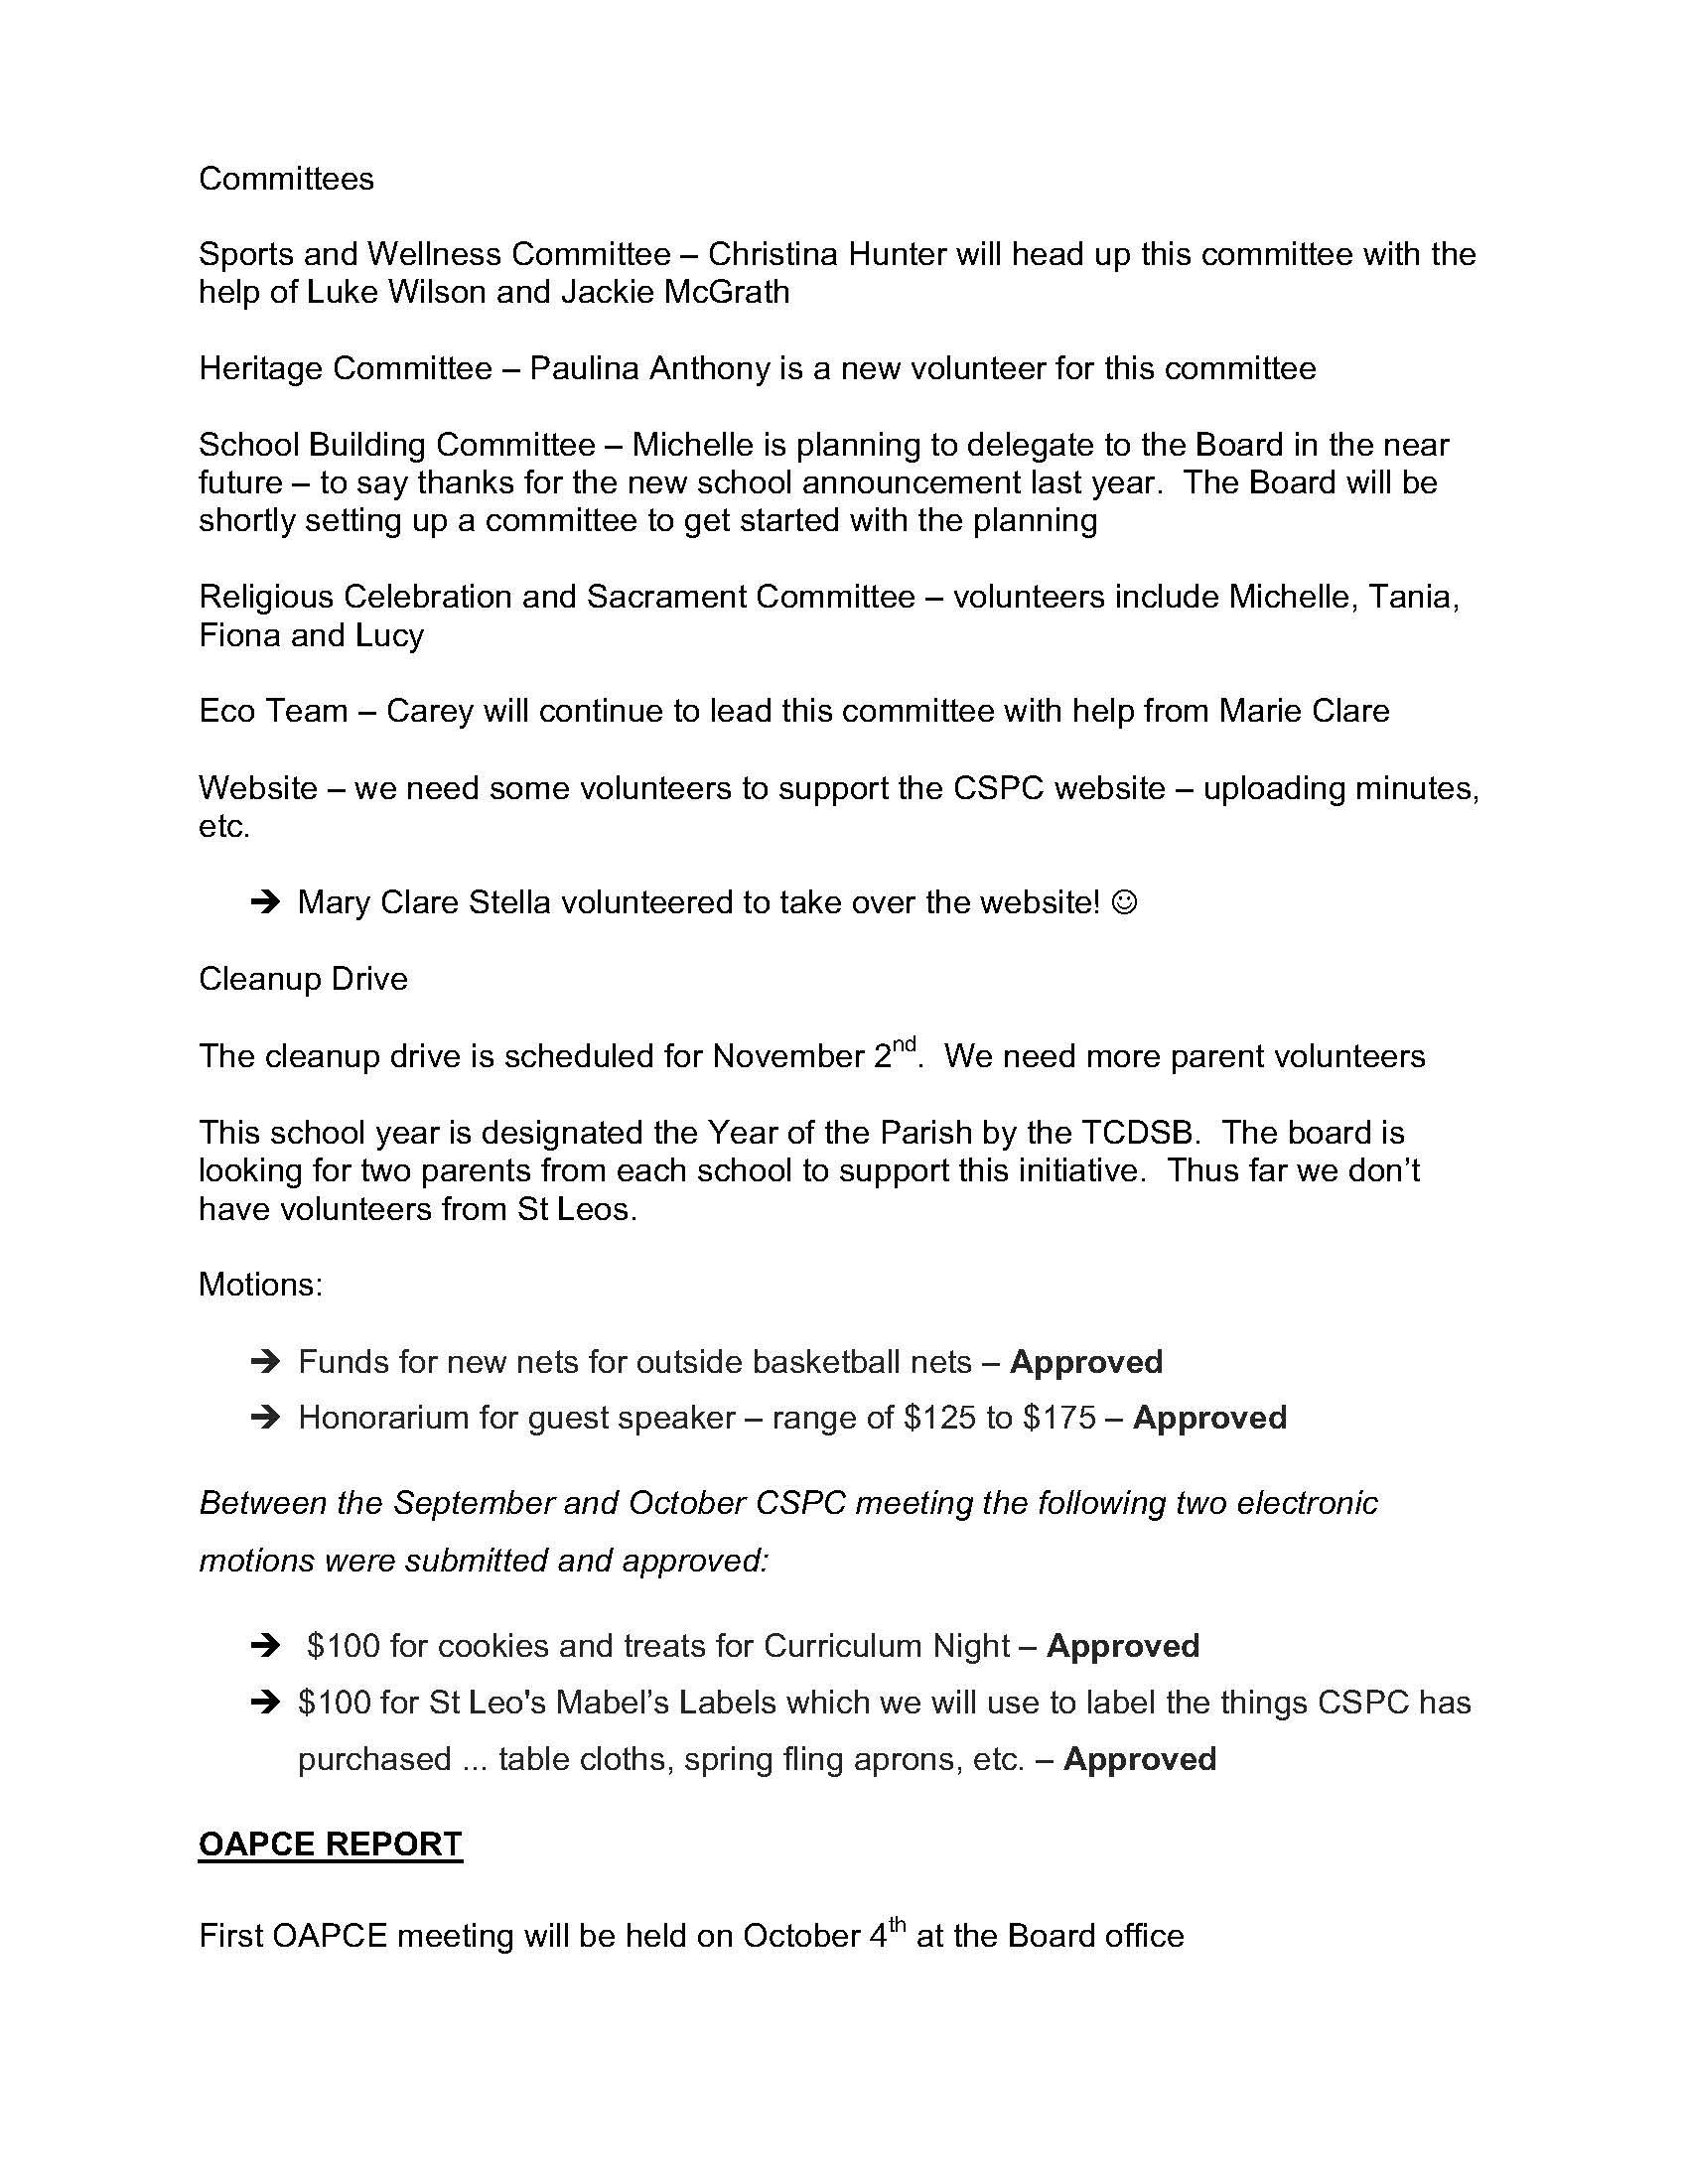 20160921_CSPC Minutes_Page_4.jpg